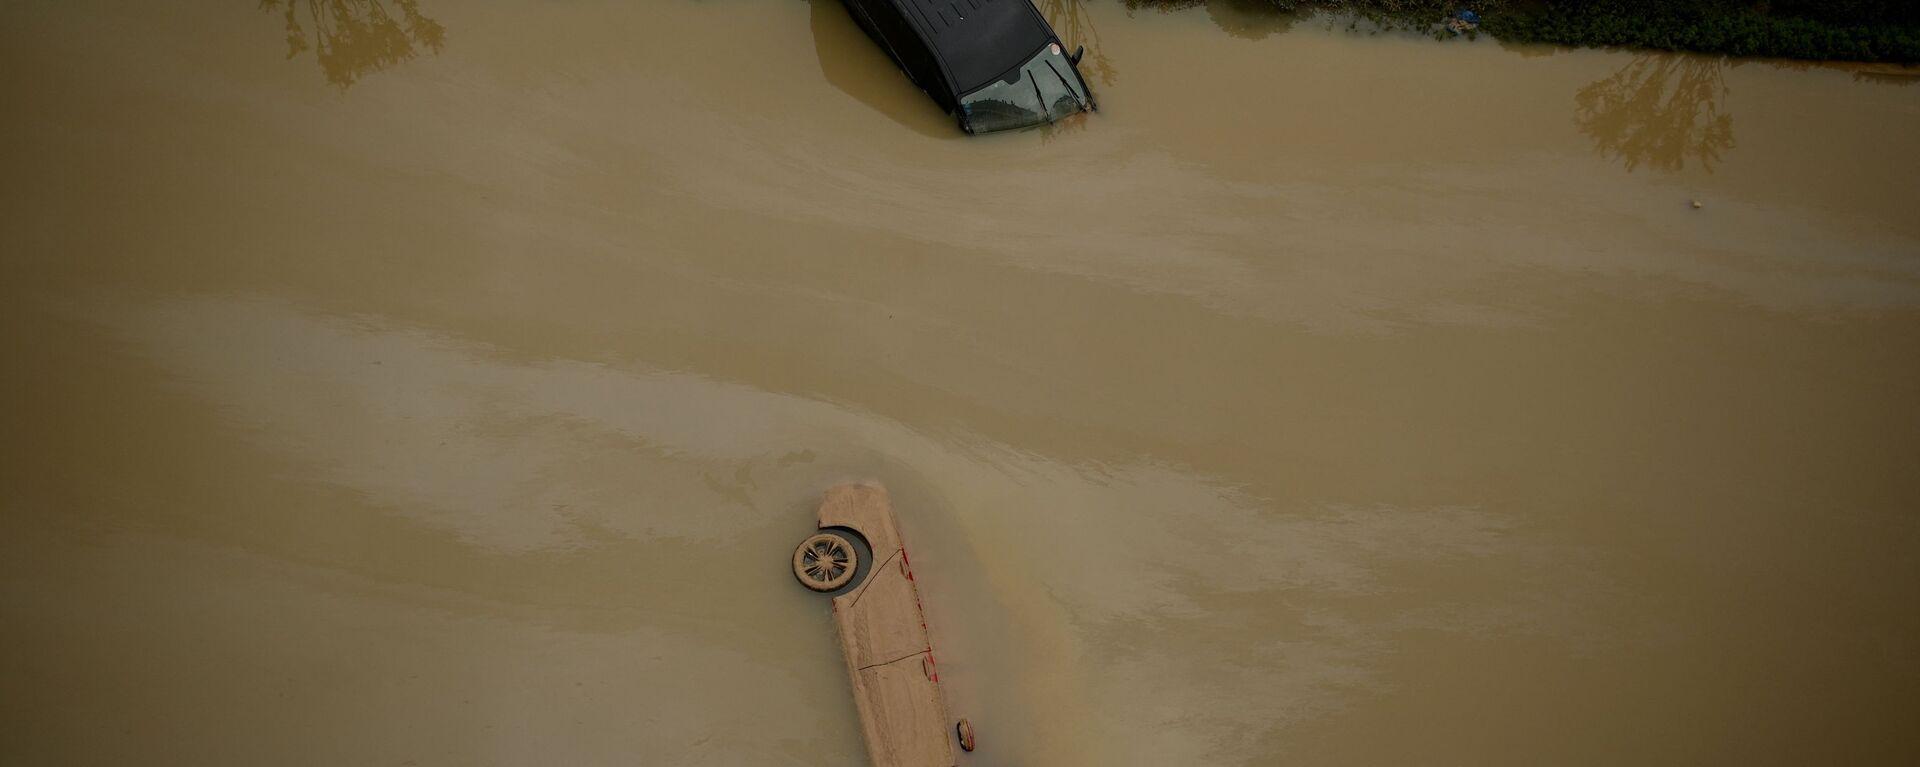 Inondazioni nel Henan - Sputnik Italia, 1920, 29.07.2021